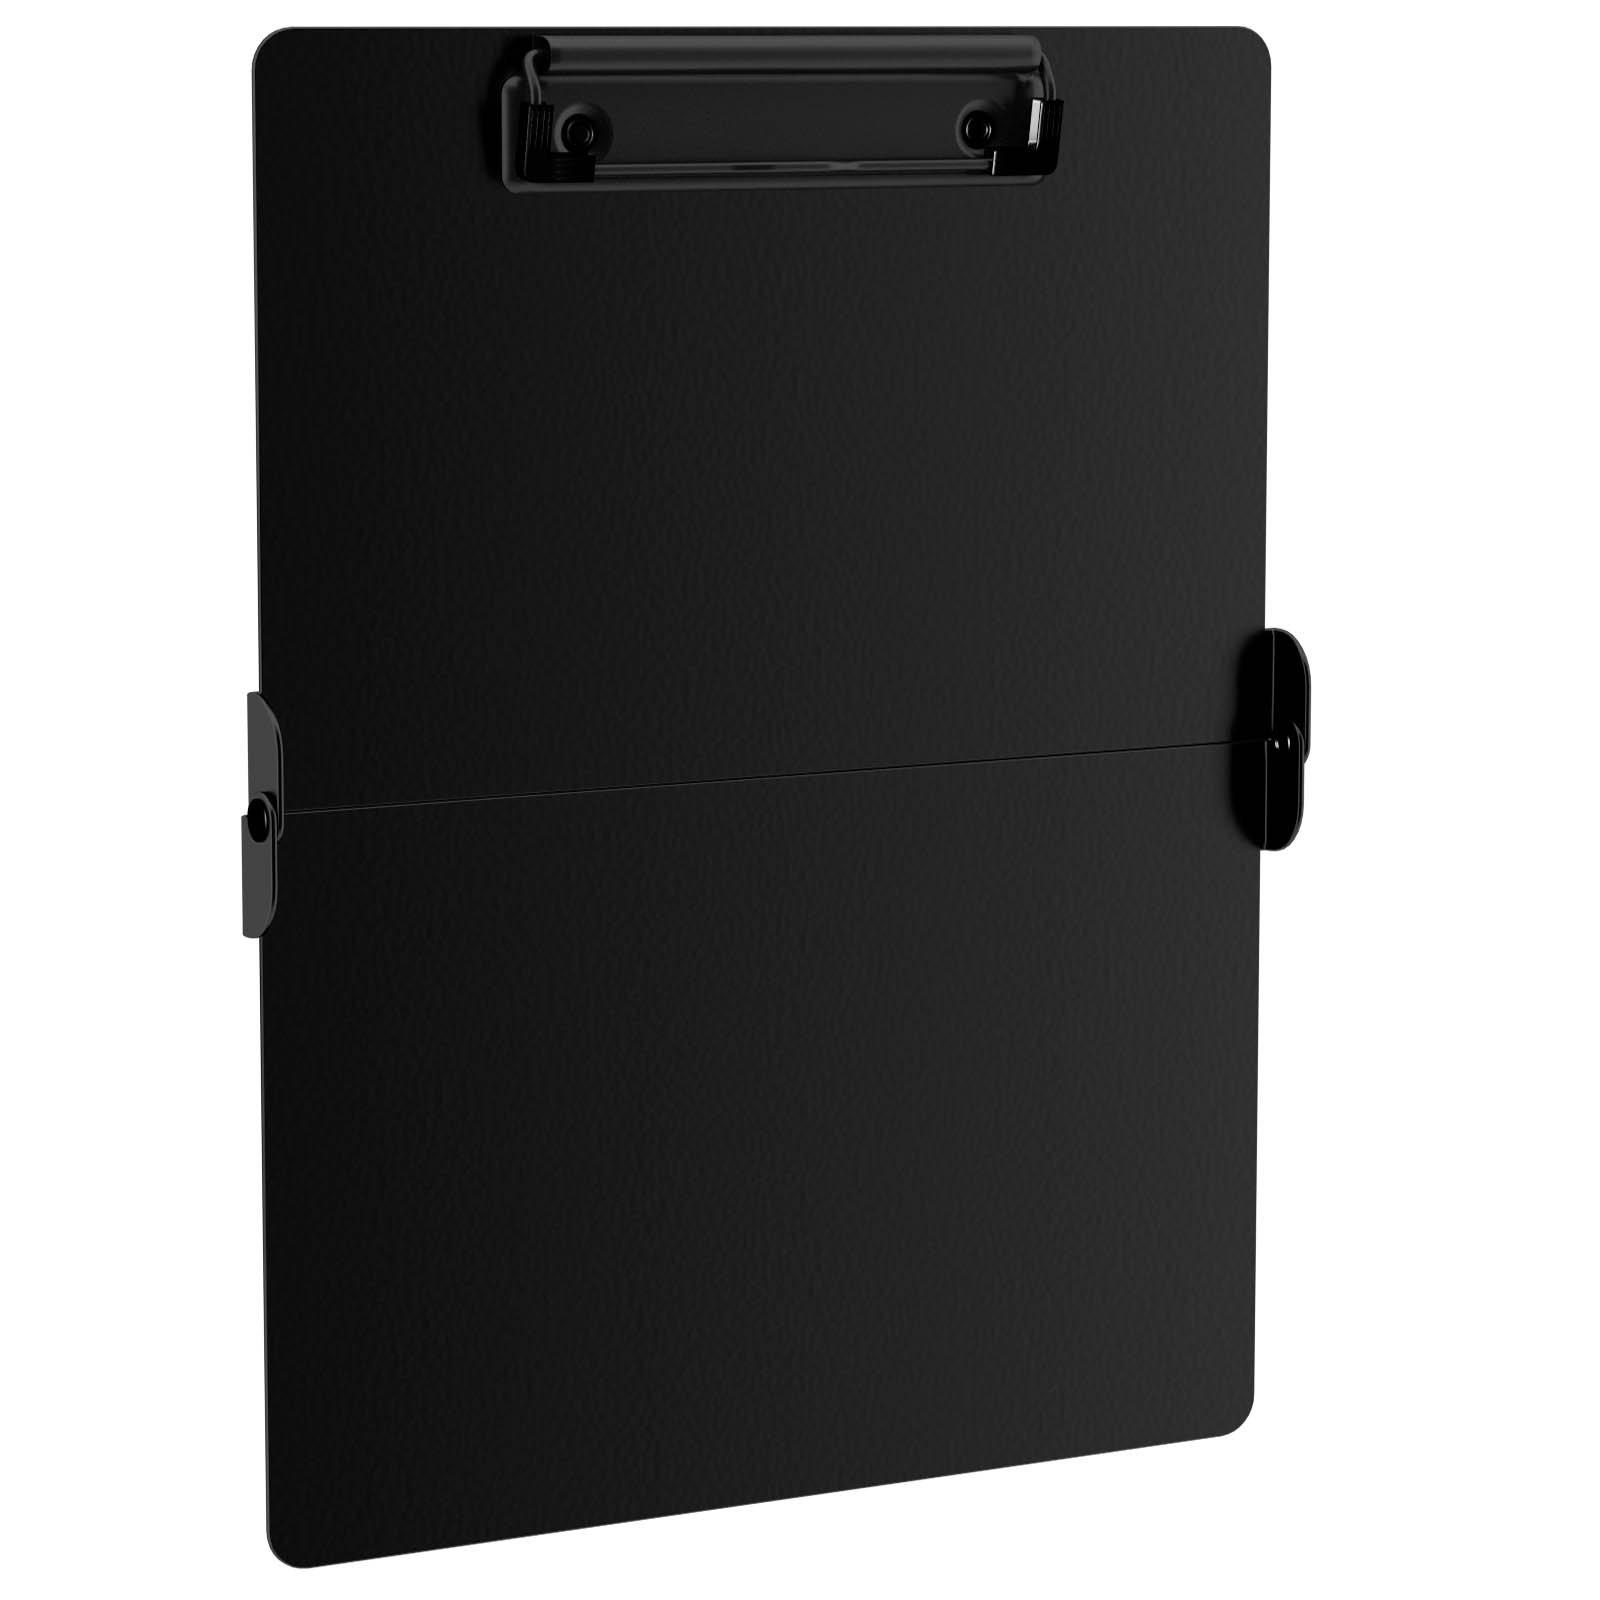 Blackout ISO Clipboard